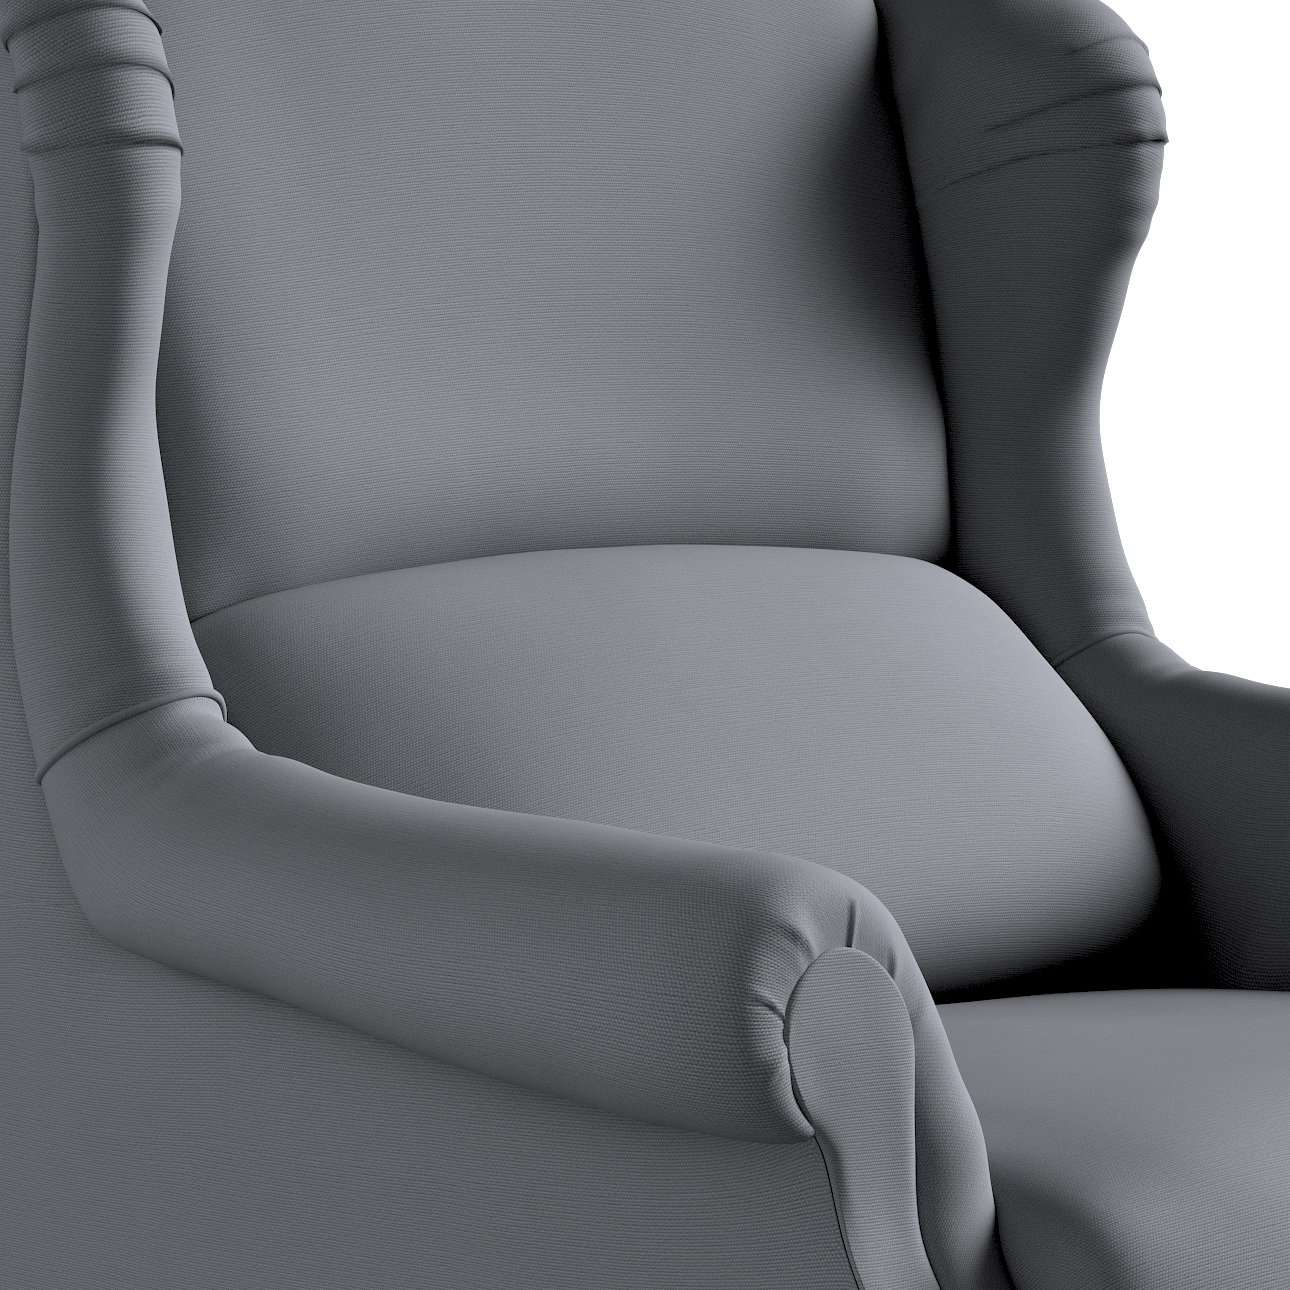 Fotel Unique w kolekcji Cotton Panama, tkanina: 702-07